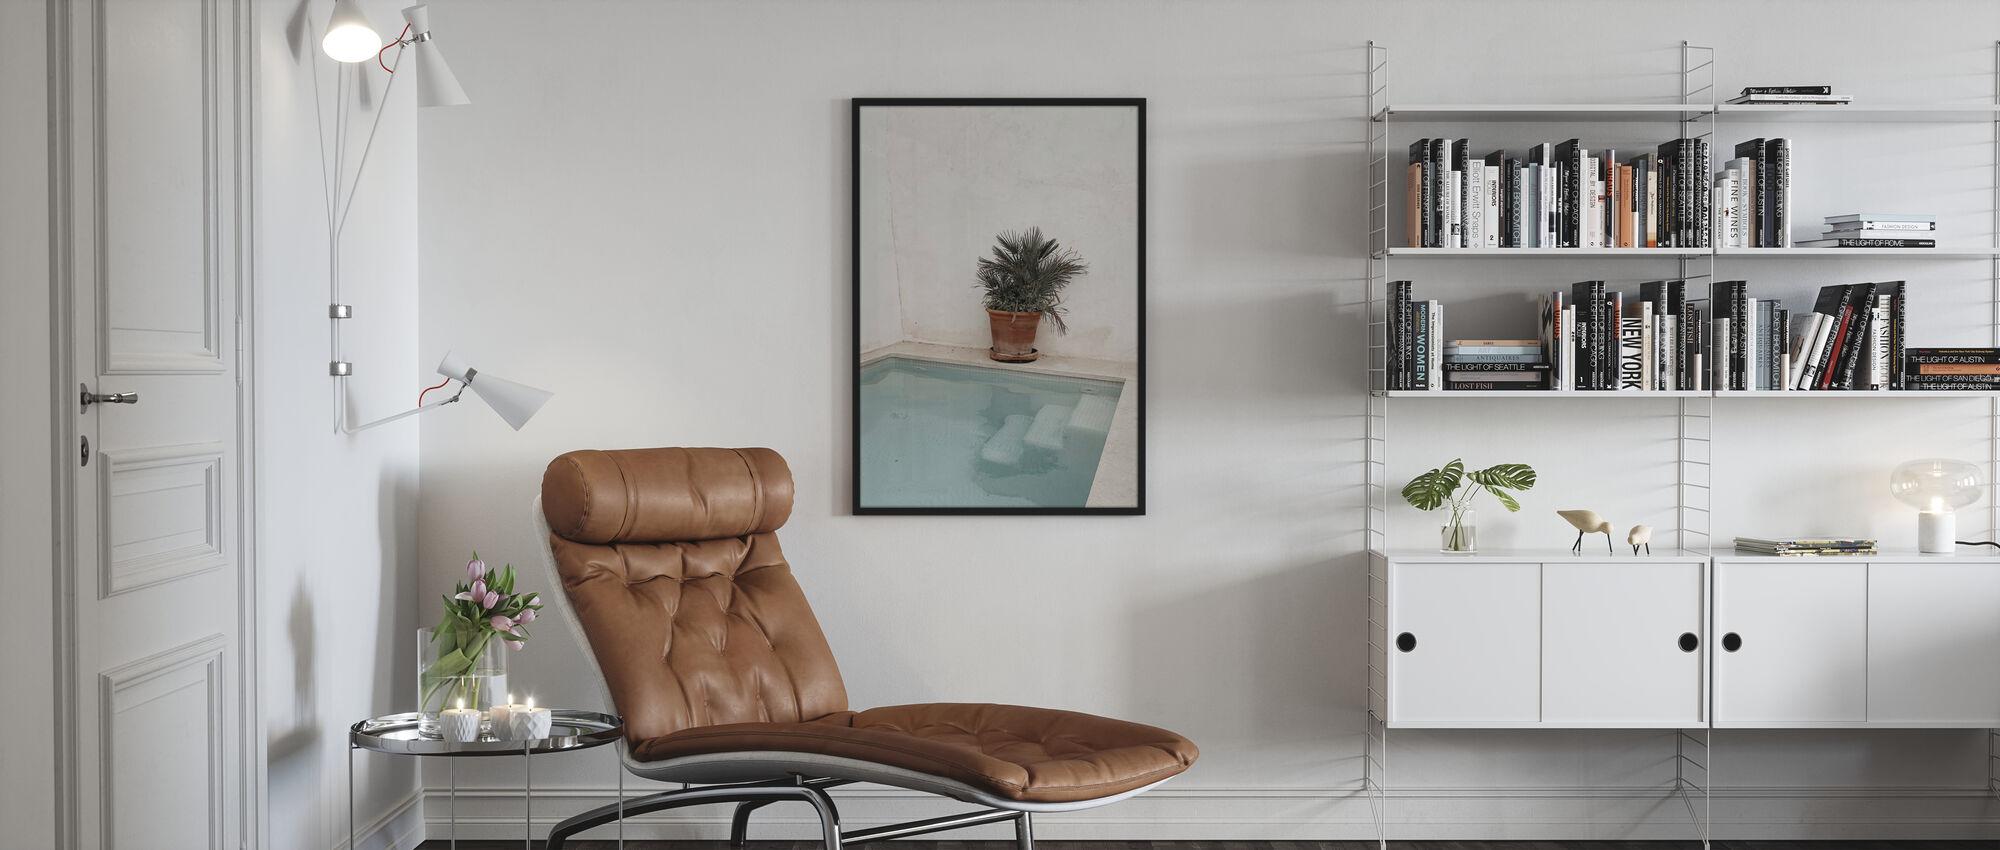 Ende des Sommers - Poster - Wohnzimmer